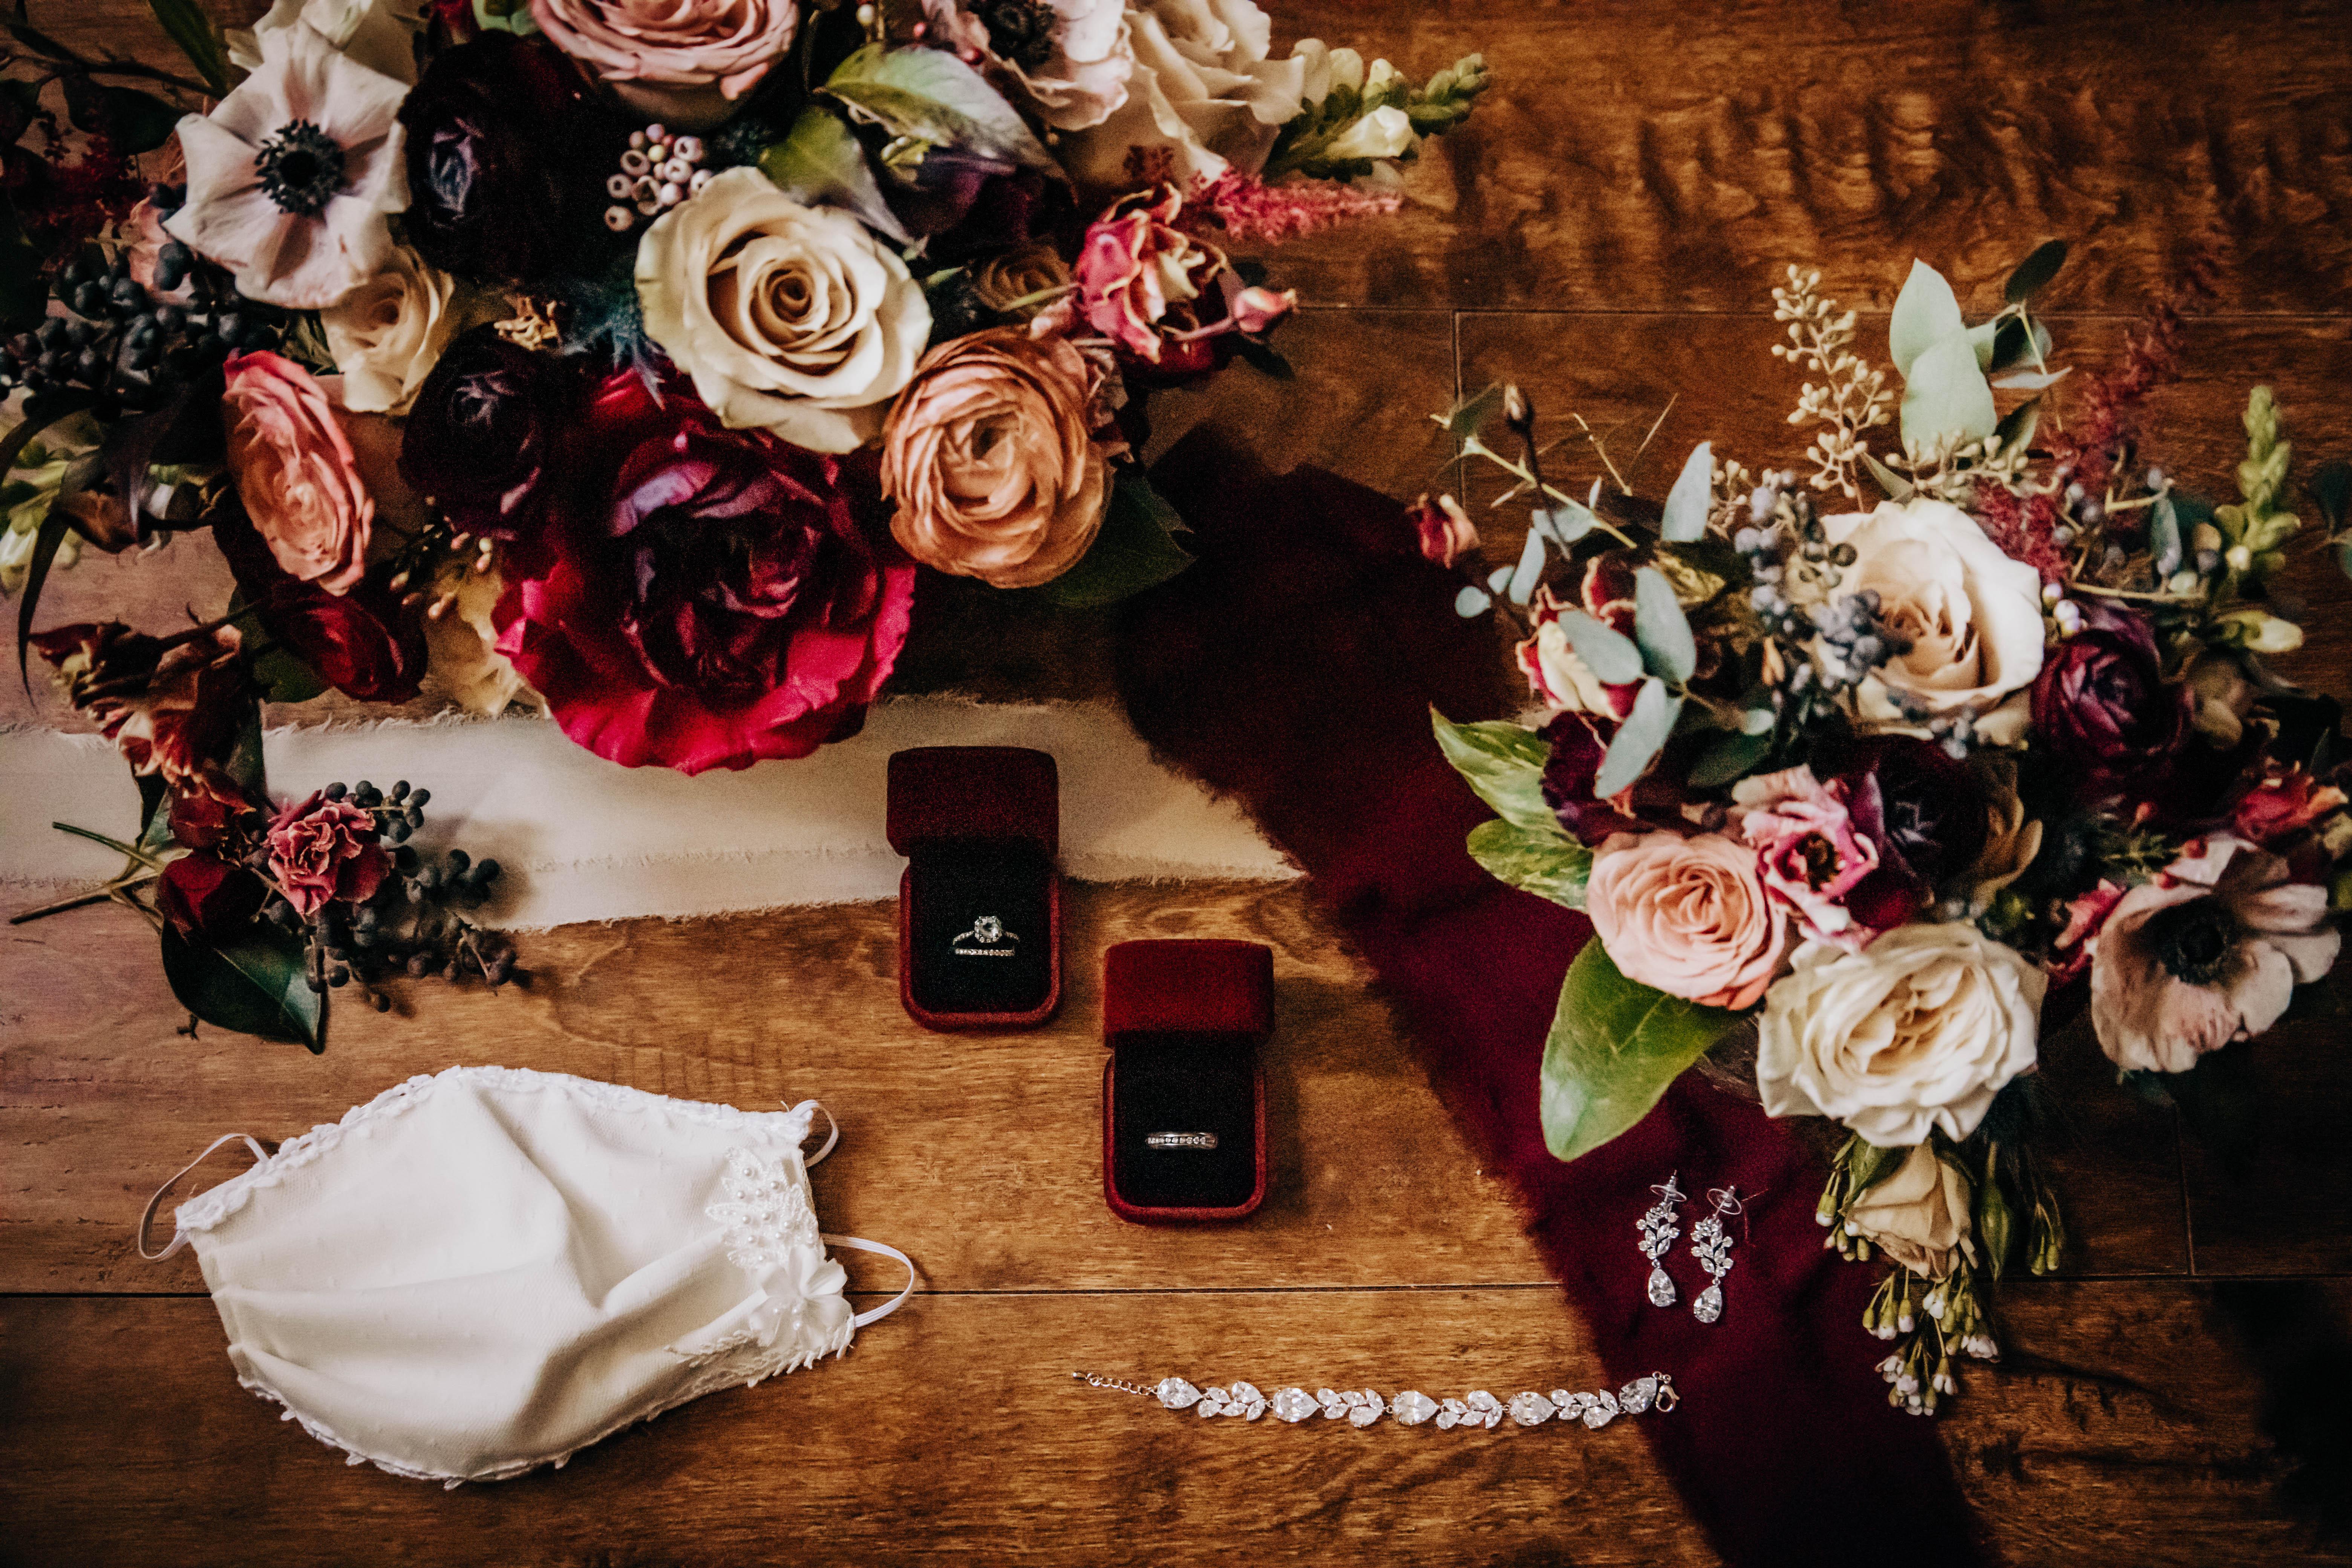 los-angeles-wedding-california-whittier-